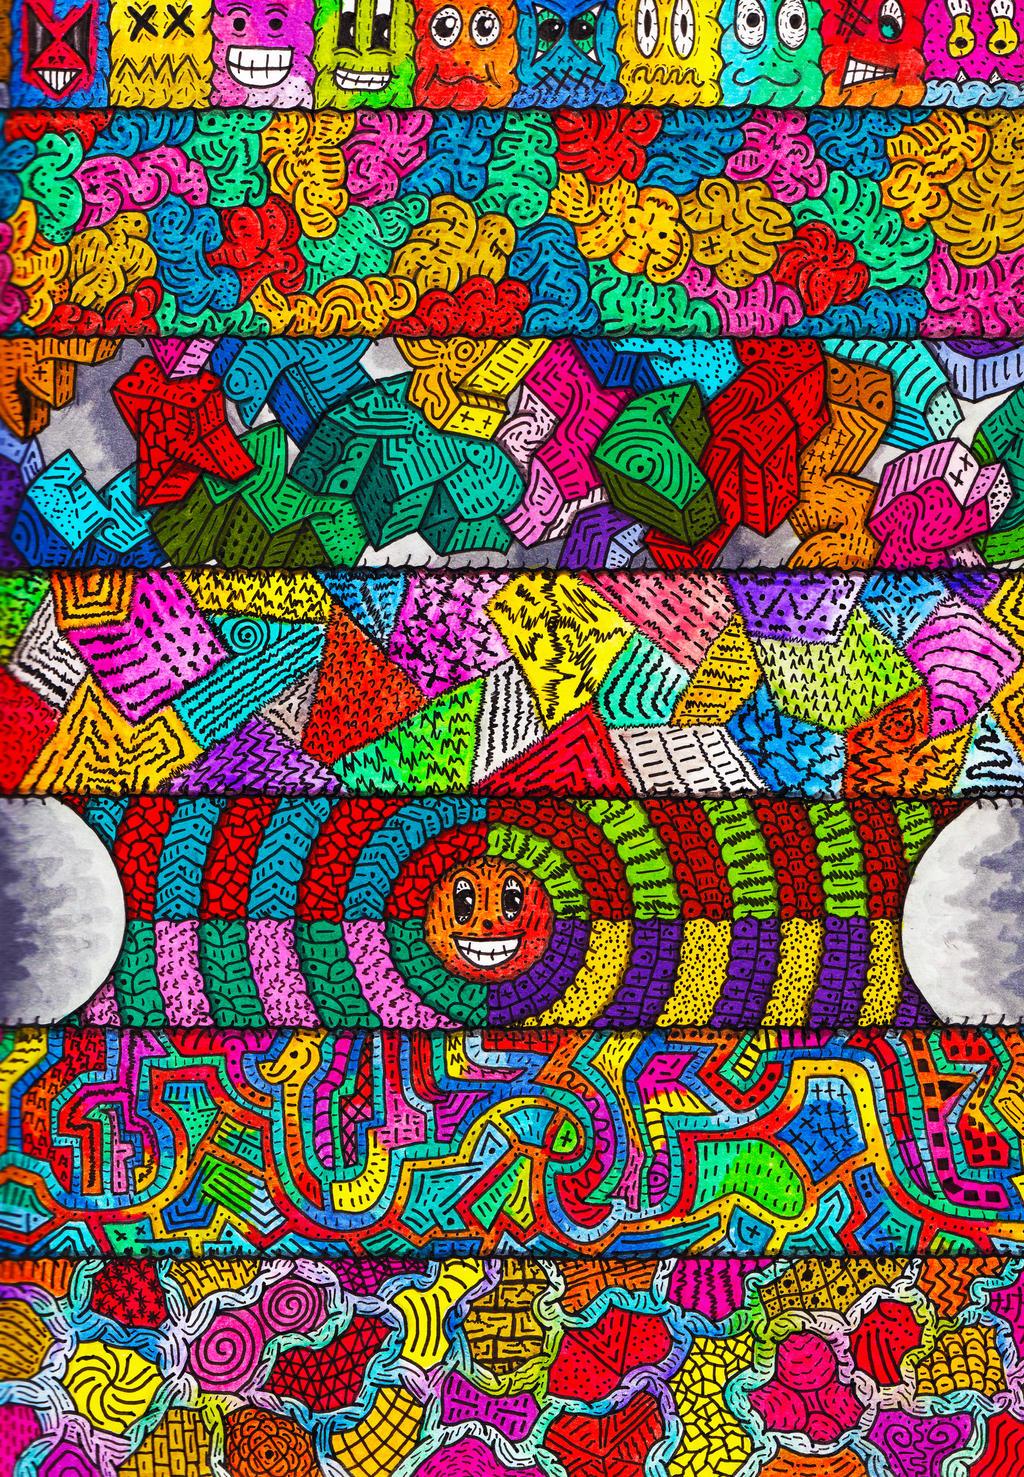 Blackbook - Stripes of Styles by Loggaa